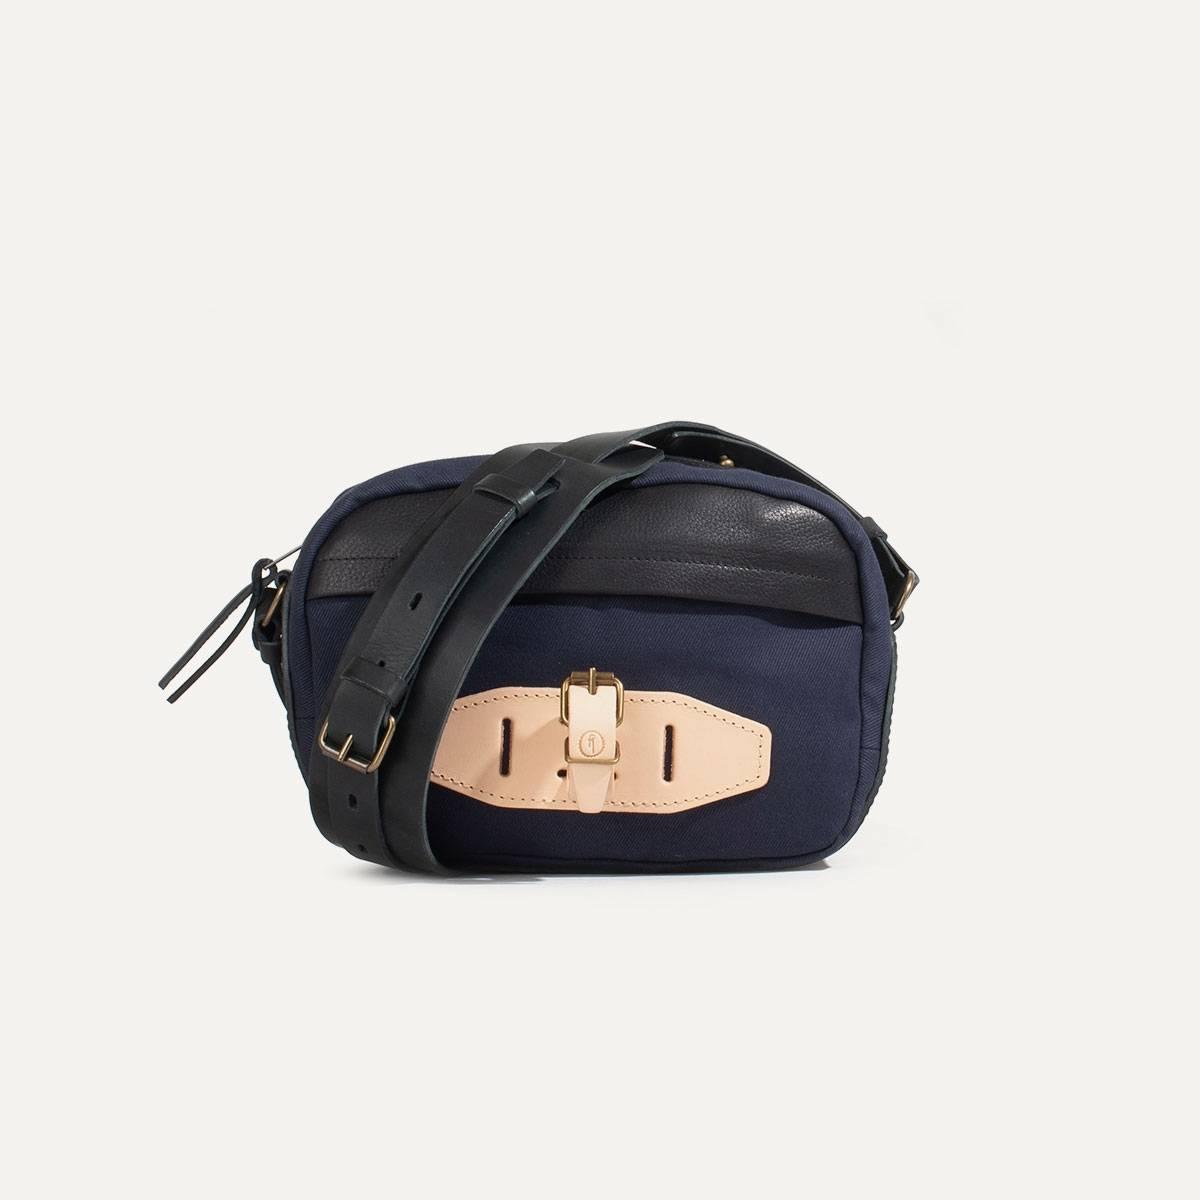 Honshu Belt bag - Navy / Black (image n°2)